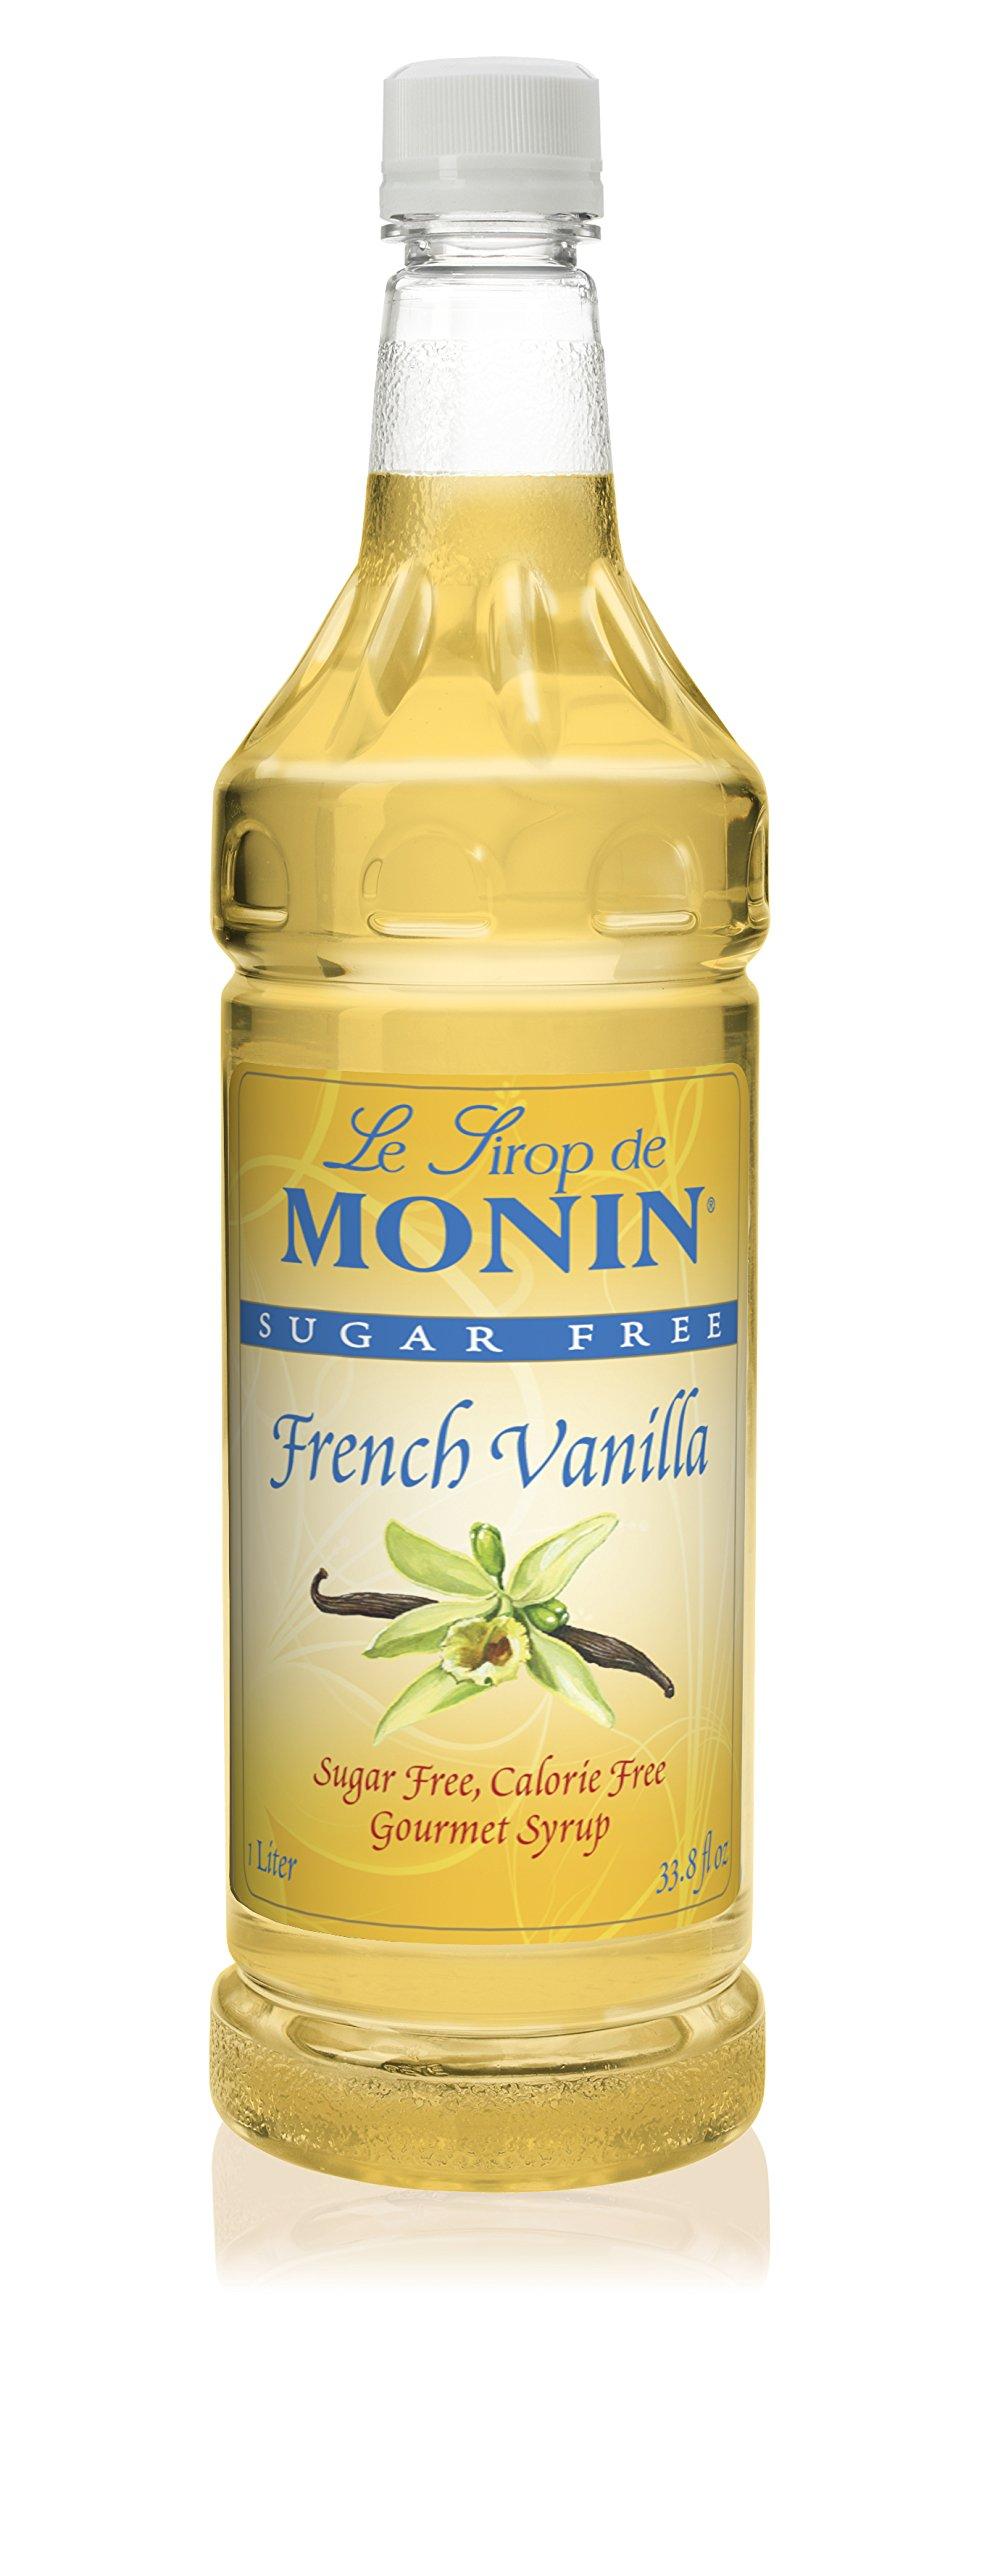 Monin - Sugar Free French Vanilla Syrup, Bold Vanilla Bean Flavor, Great for Coffee, Cocktails, & Lattes, Gluten-Free, Vegan, Non-GMO (1 Liter)